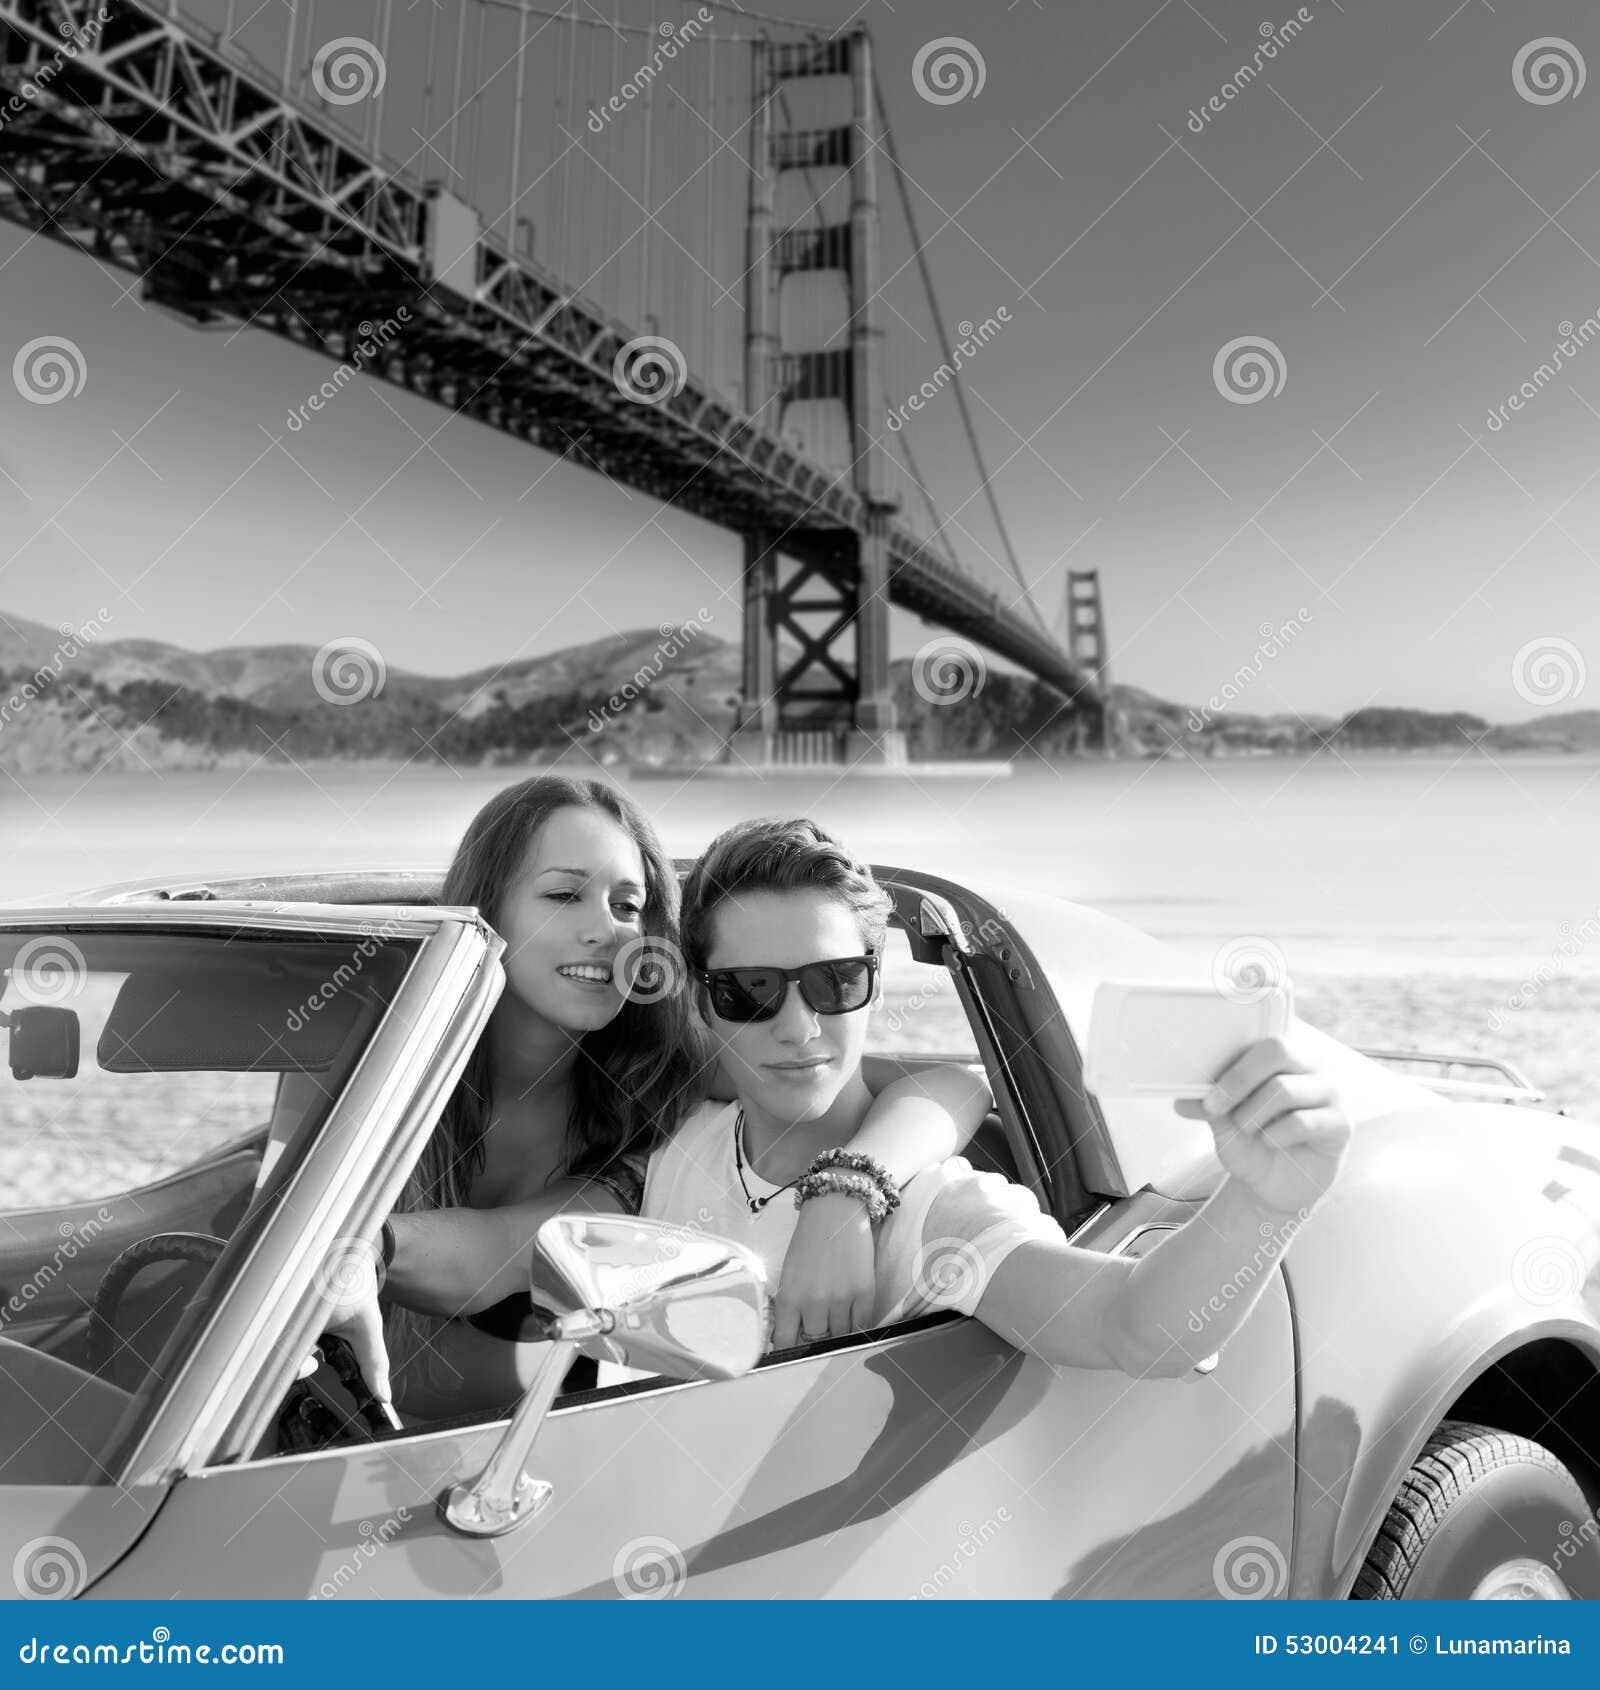 For the Teen couple on bridge logically